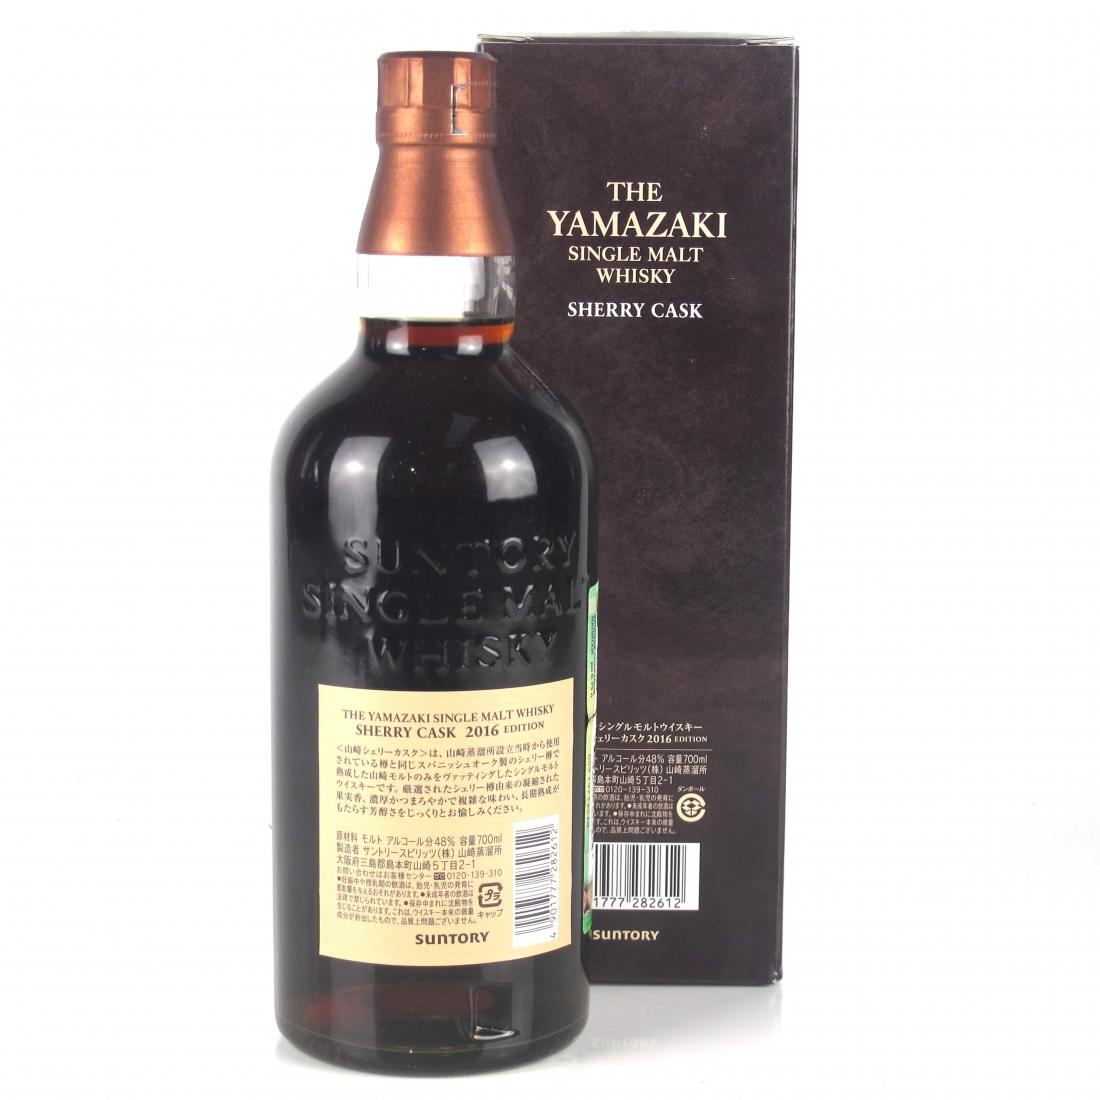 Yamazaki Sherry Cask 2016